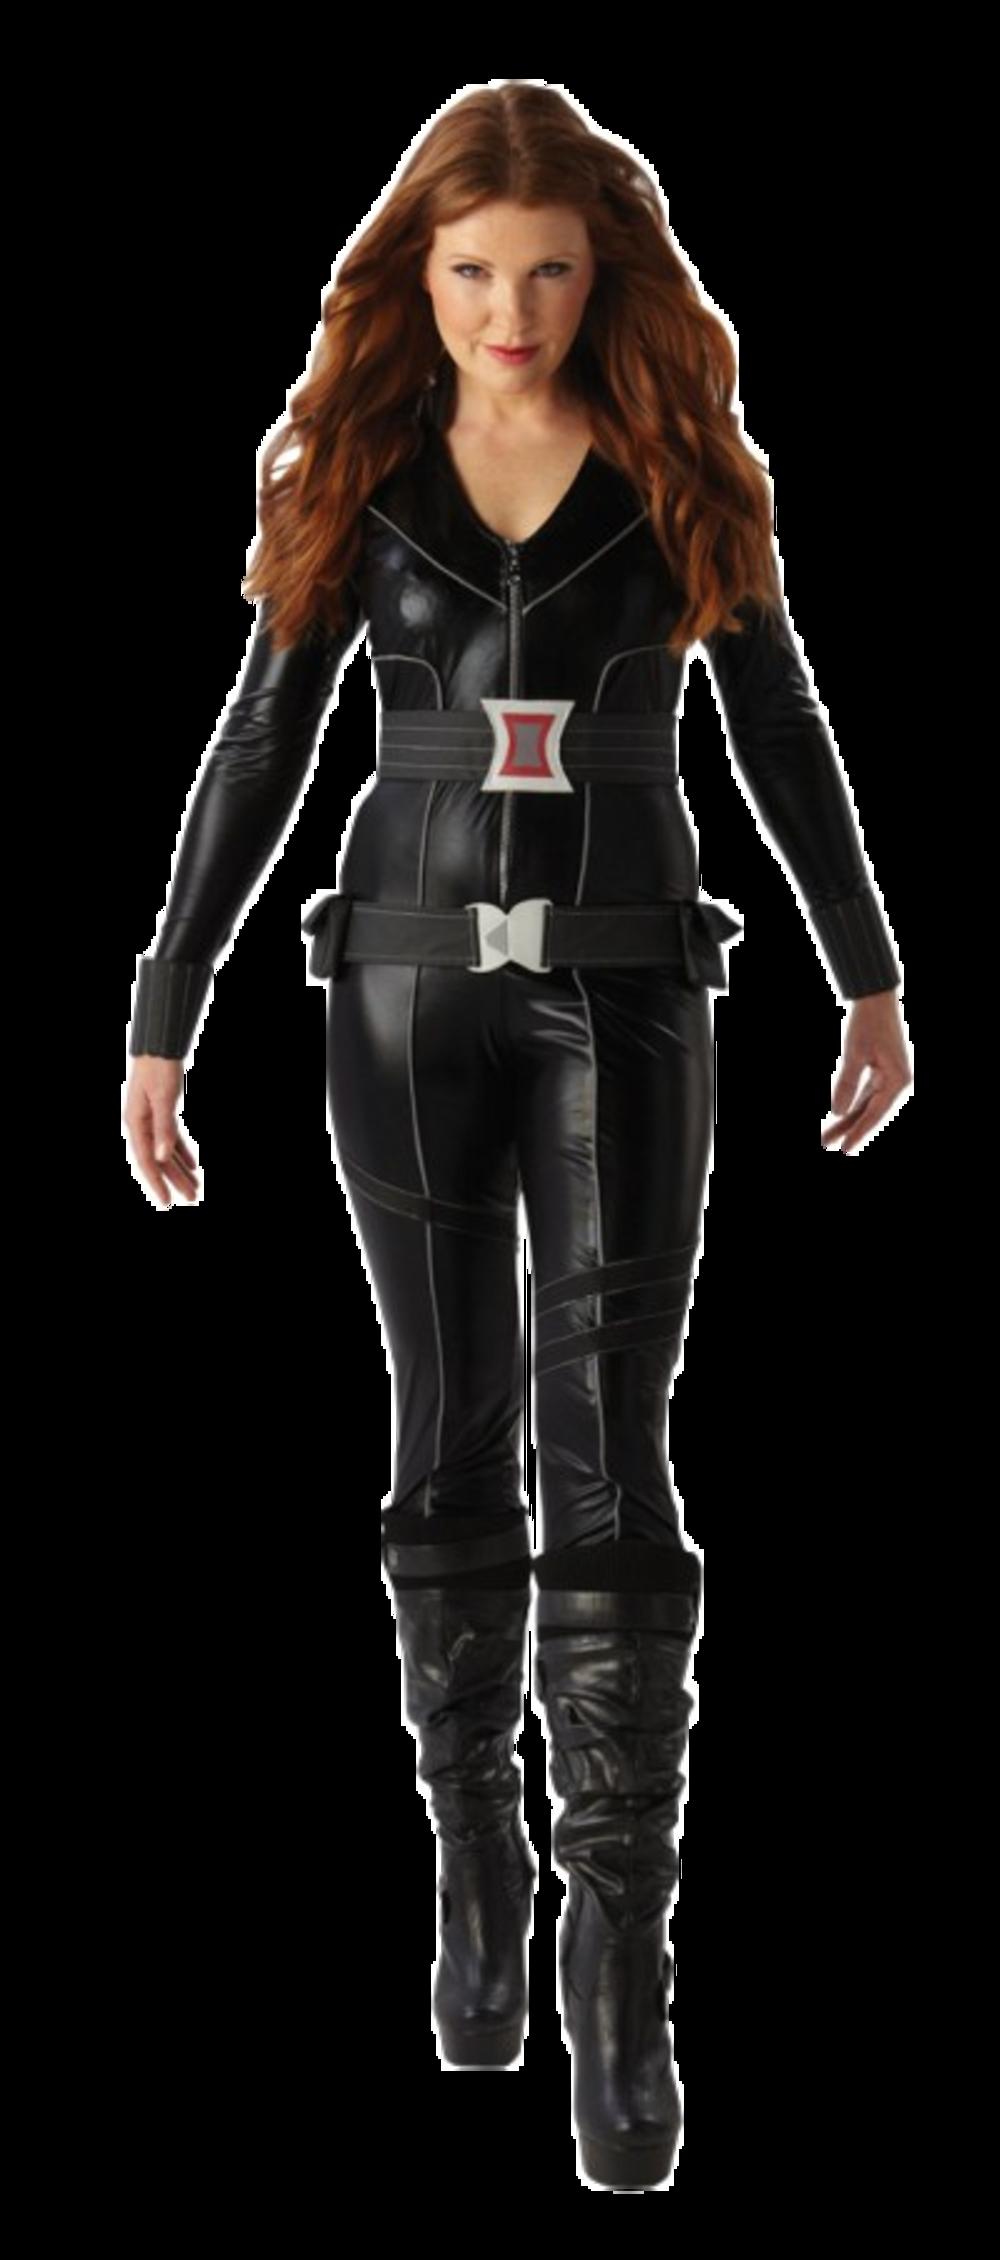 Black Widow Superhero Ladies Fancy Dress The Avengers Halloween Womens Costume